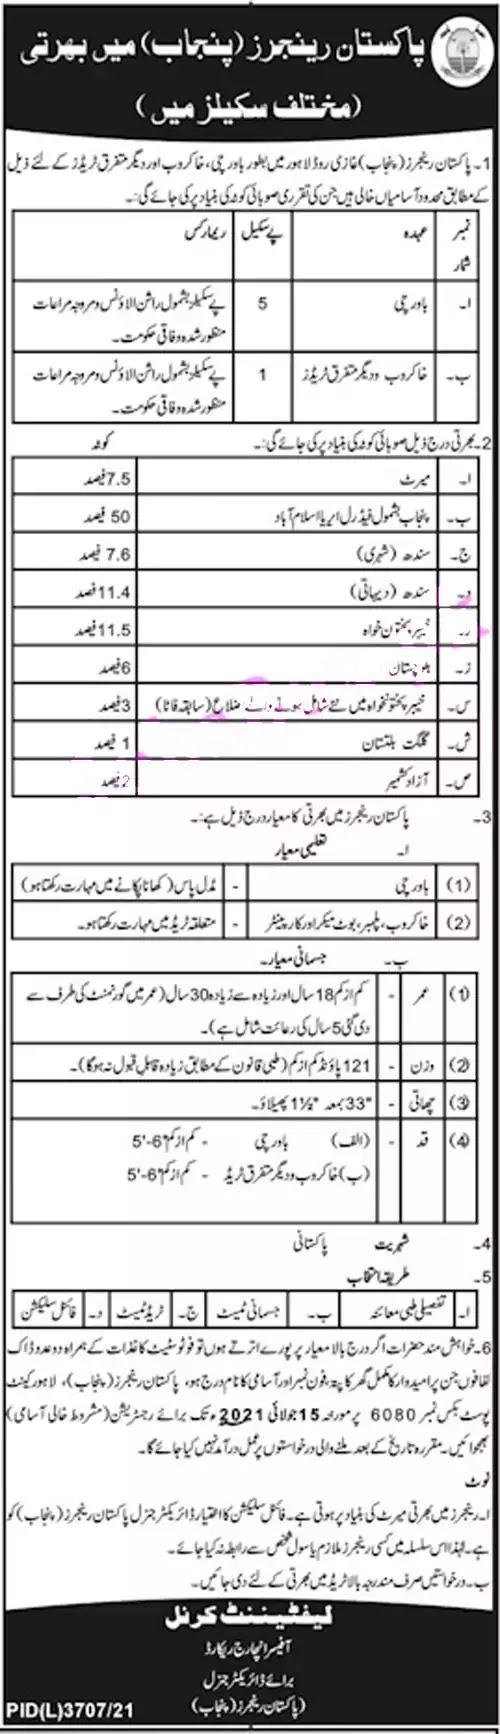 Pakistan Punjab Rangers Jobs 2021 || Pakistan Rangers Civilian Jobs 2021